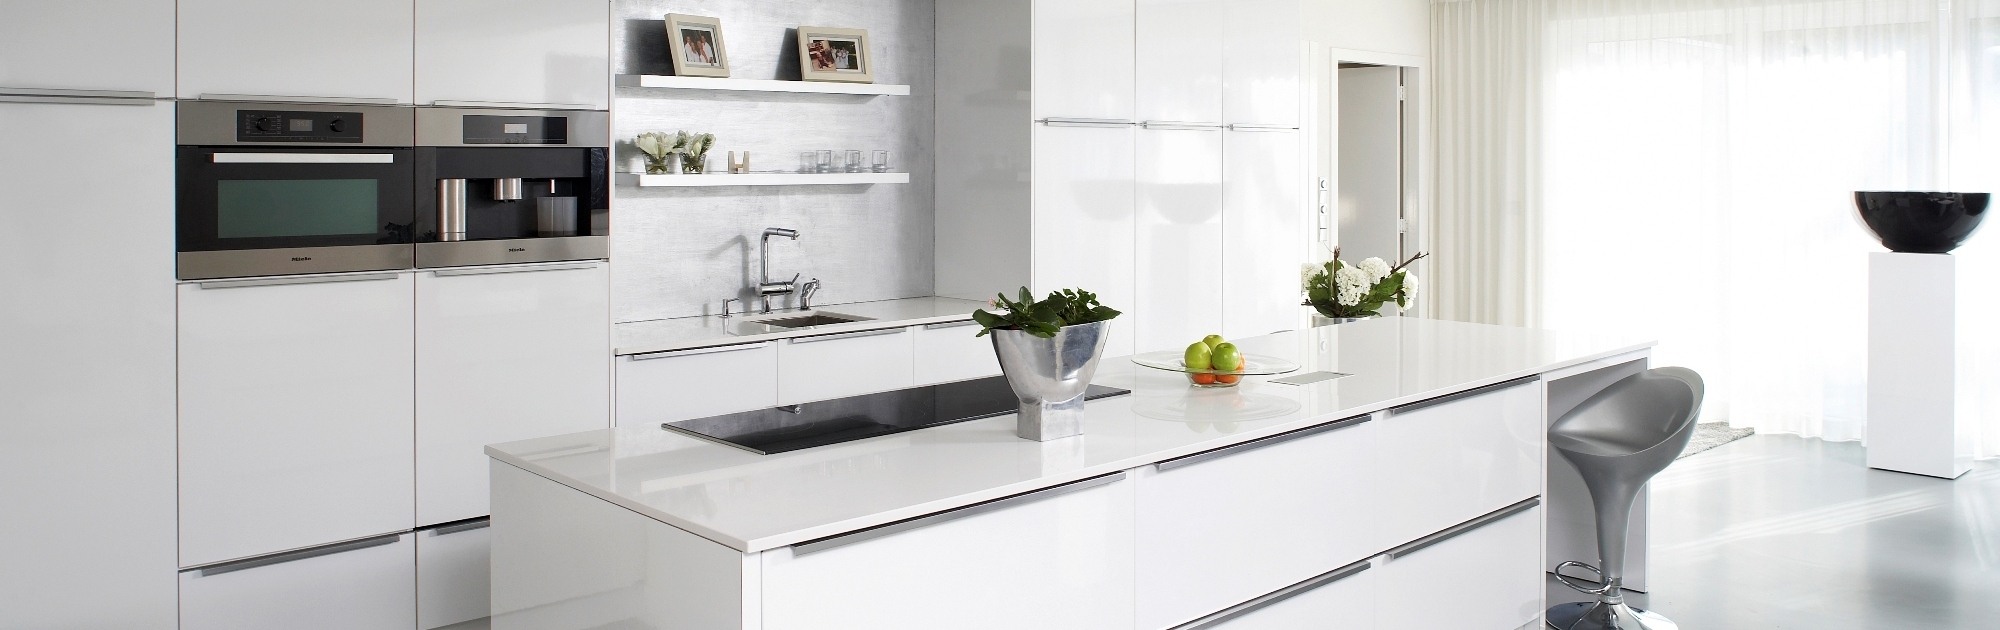 keukens keukenkasten keukens op maat elst keukens